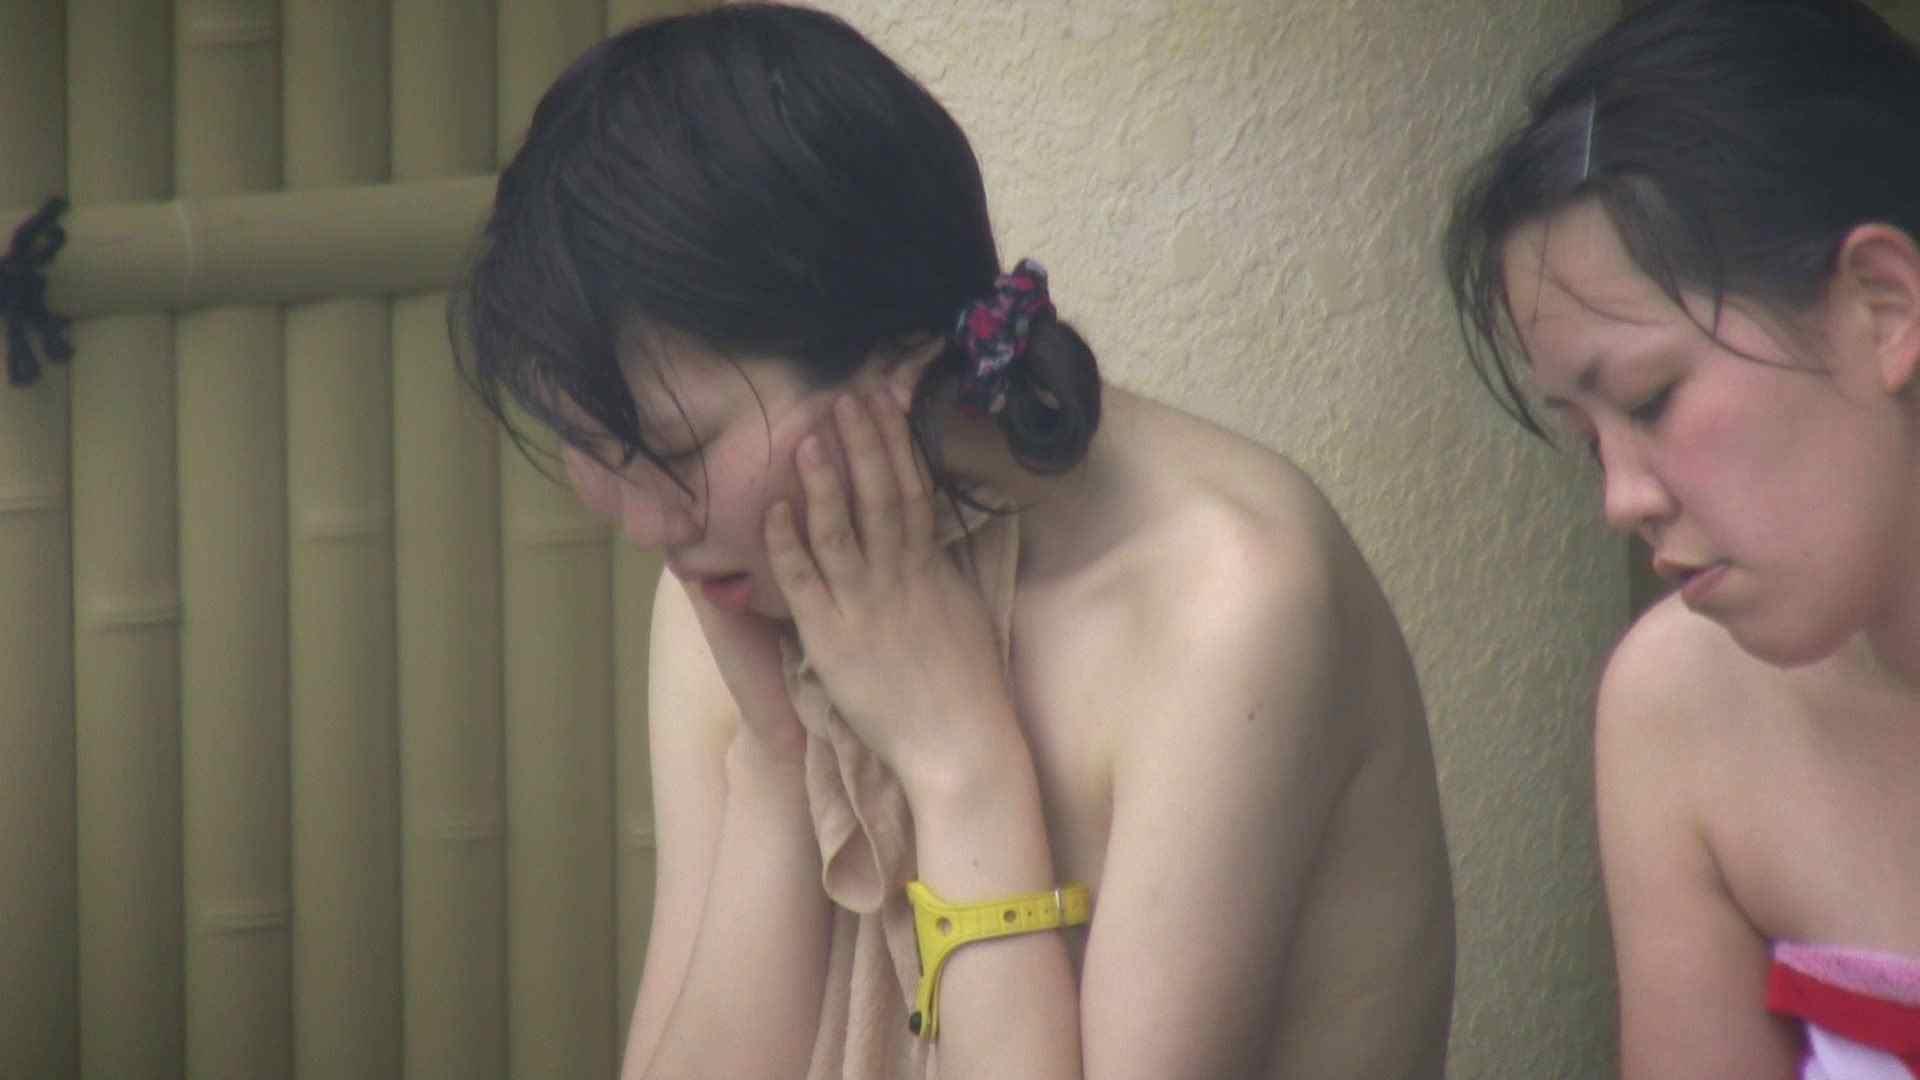 Aquaな露天風呂Vol.128 盗撮 | HなOL  51pic 46